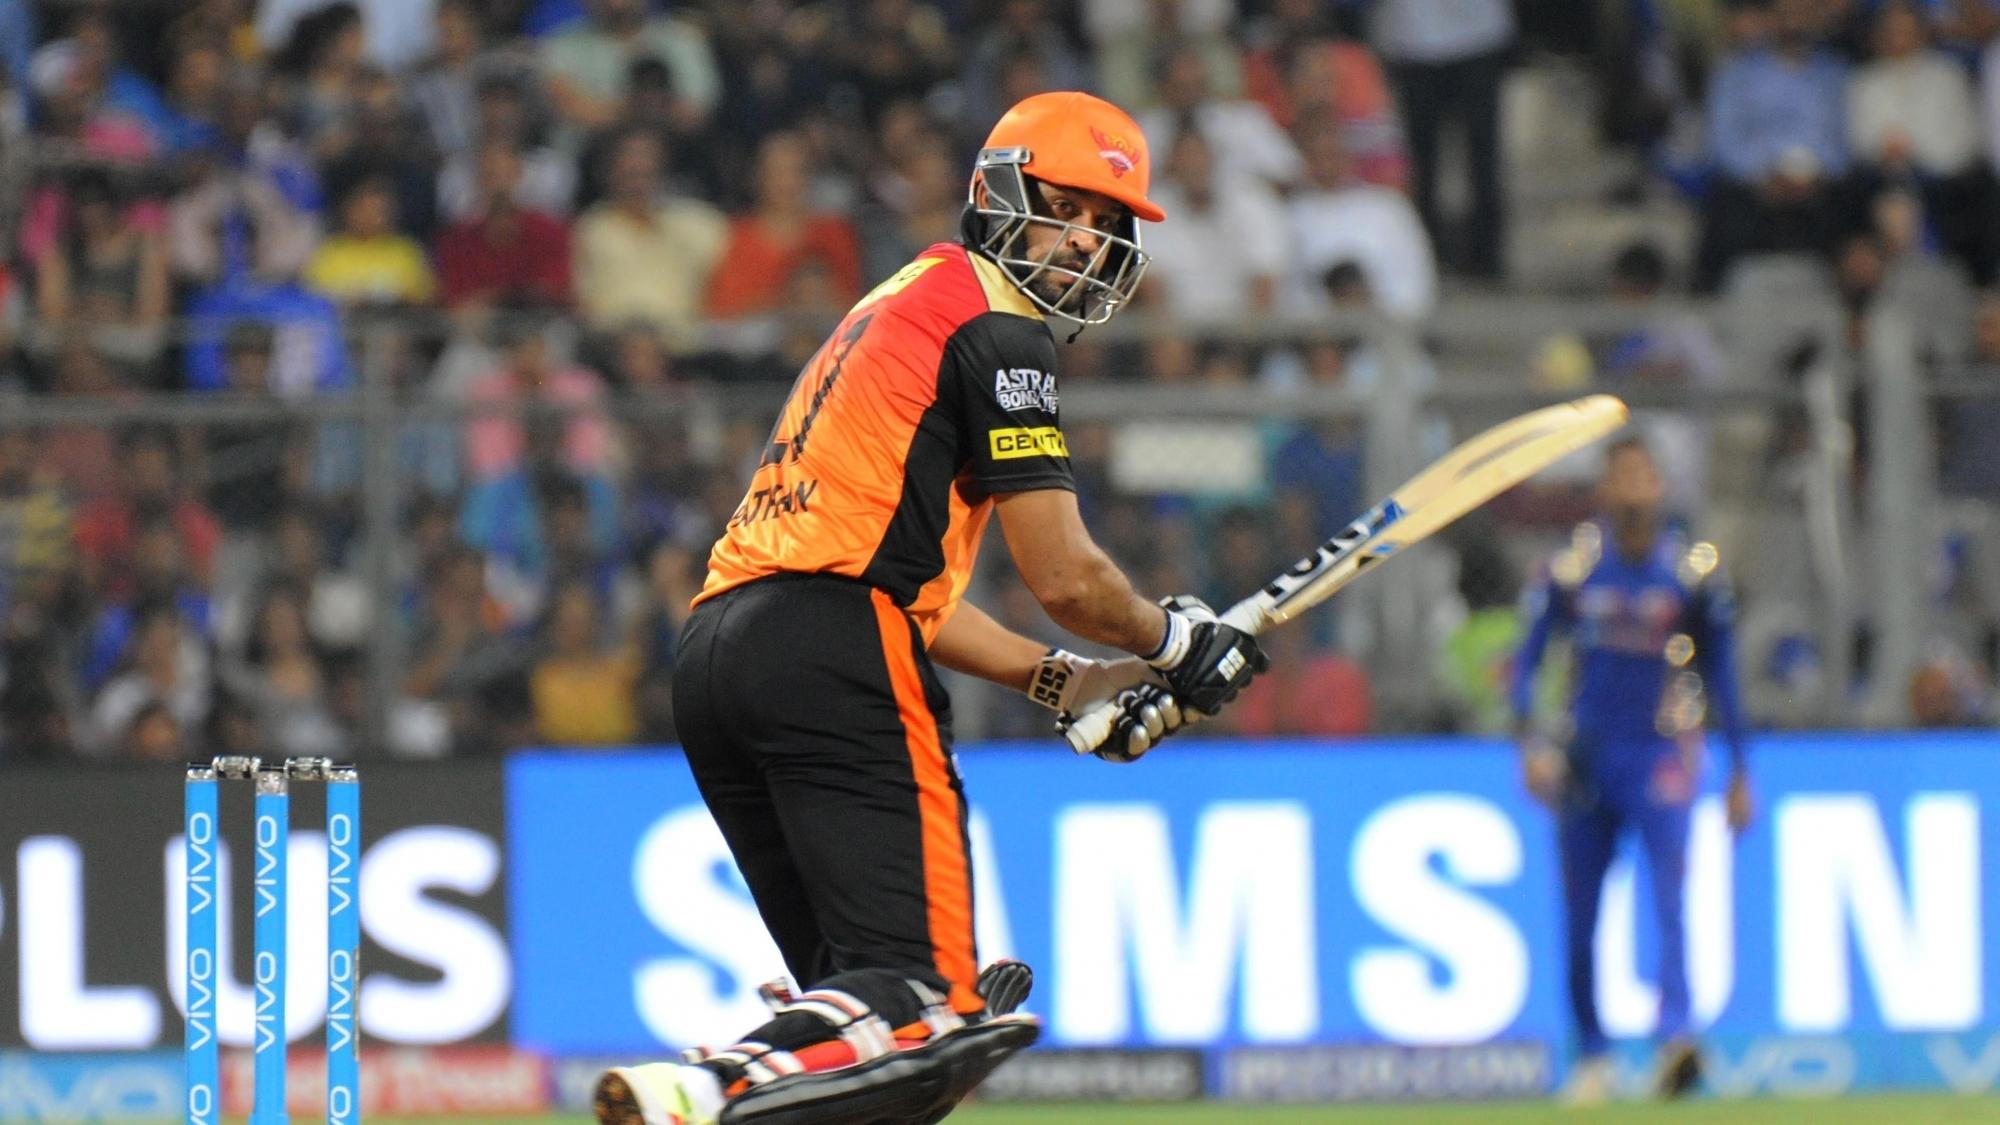 IPL 2018 : युसूफ पठान ने मुंबई इंडियन्स के खिलाफ मिली जीत को बताया ख़ास